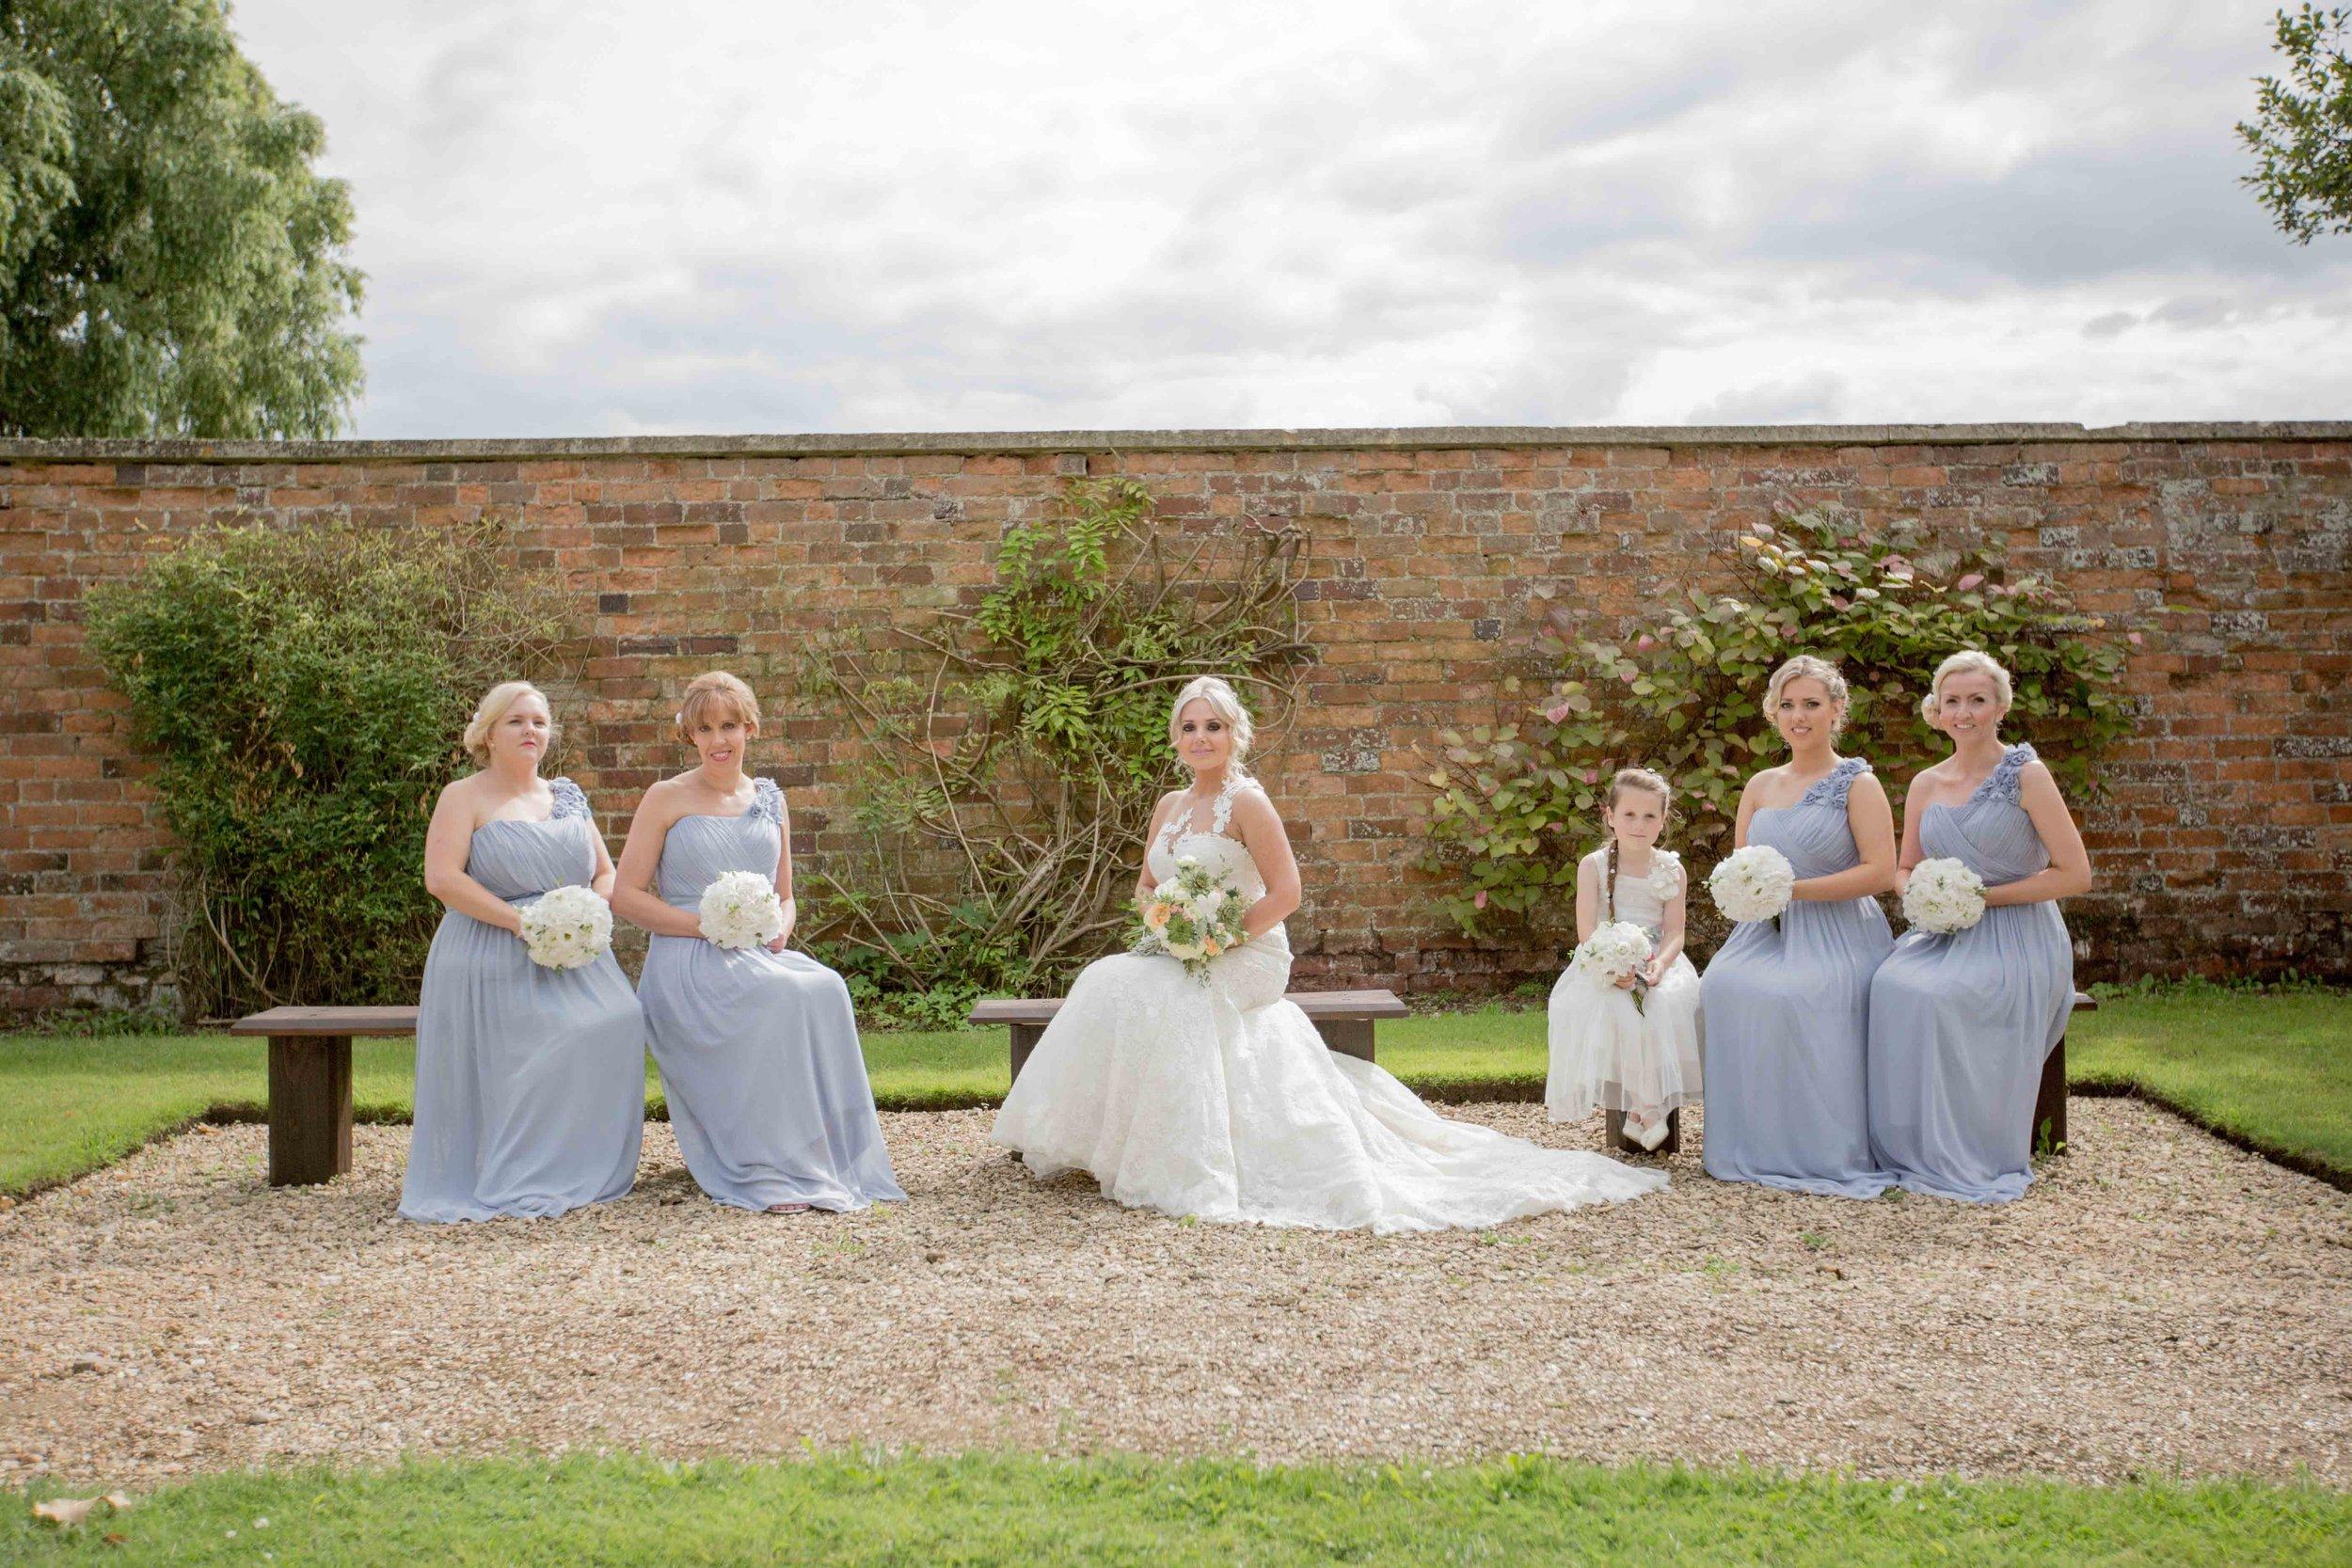 cotswold-wedding-photography-at-stonehouse-court-hotel-natalia-smith-photography-gloucestershire-wedding-photographer-56.jpg